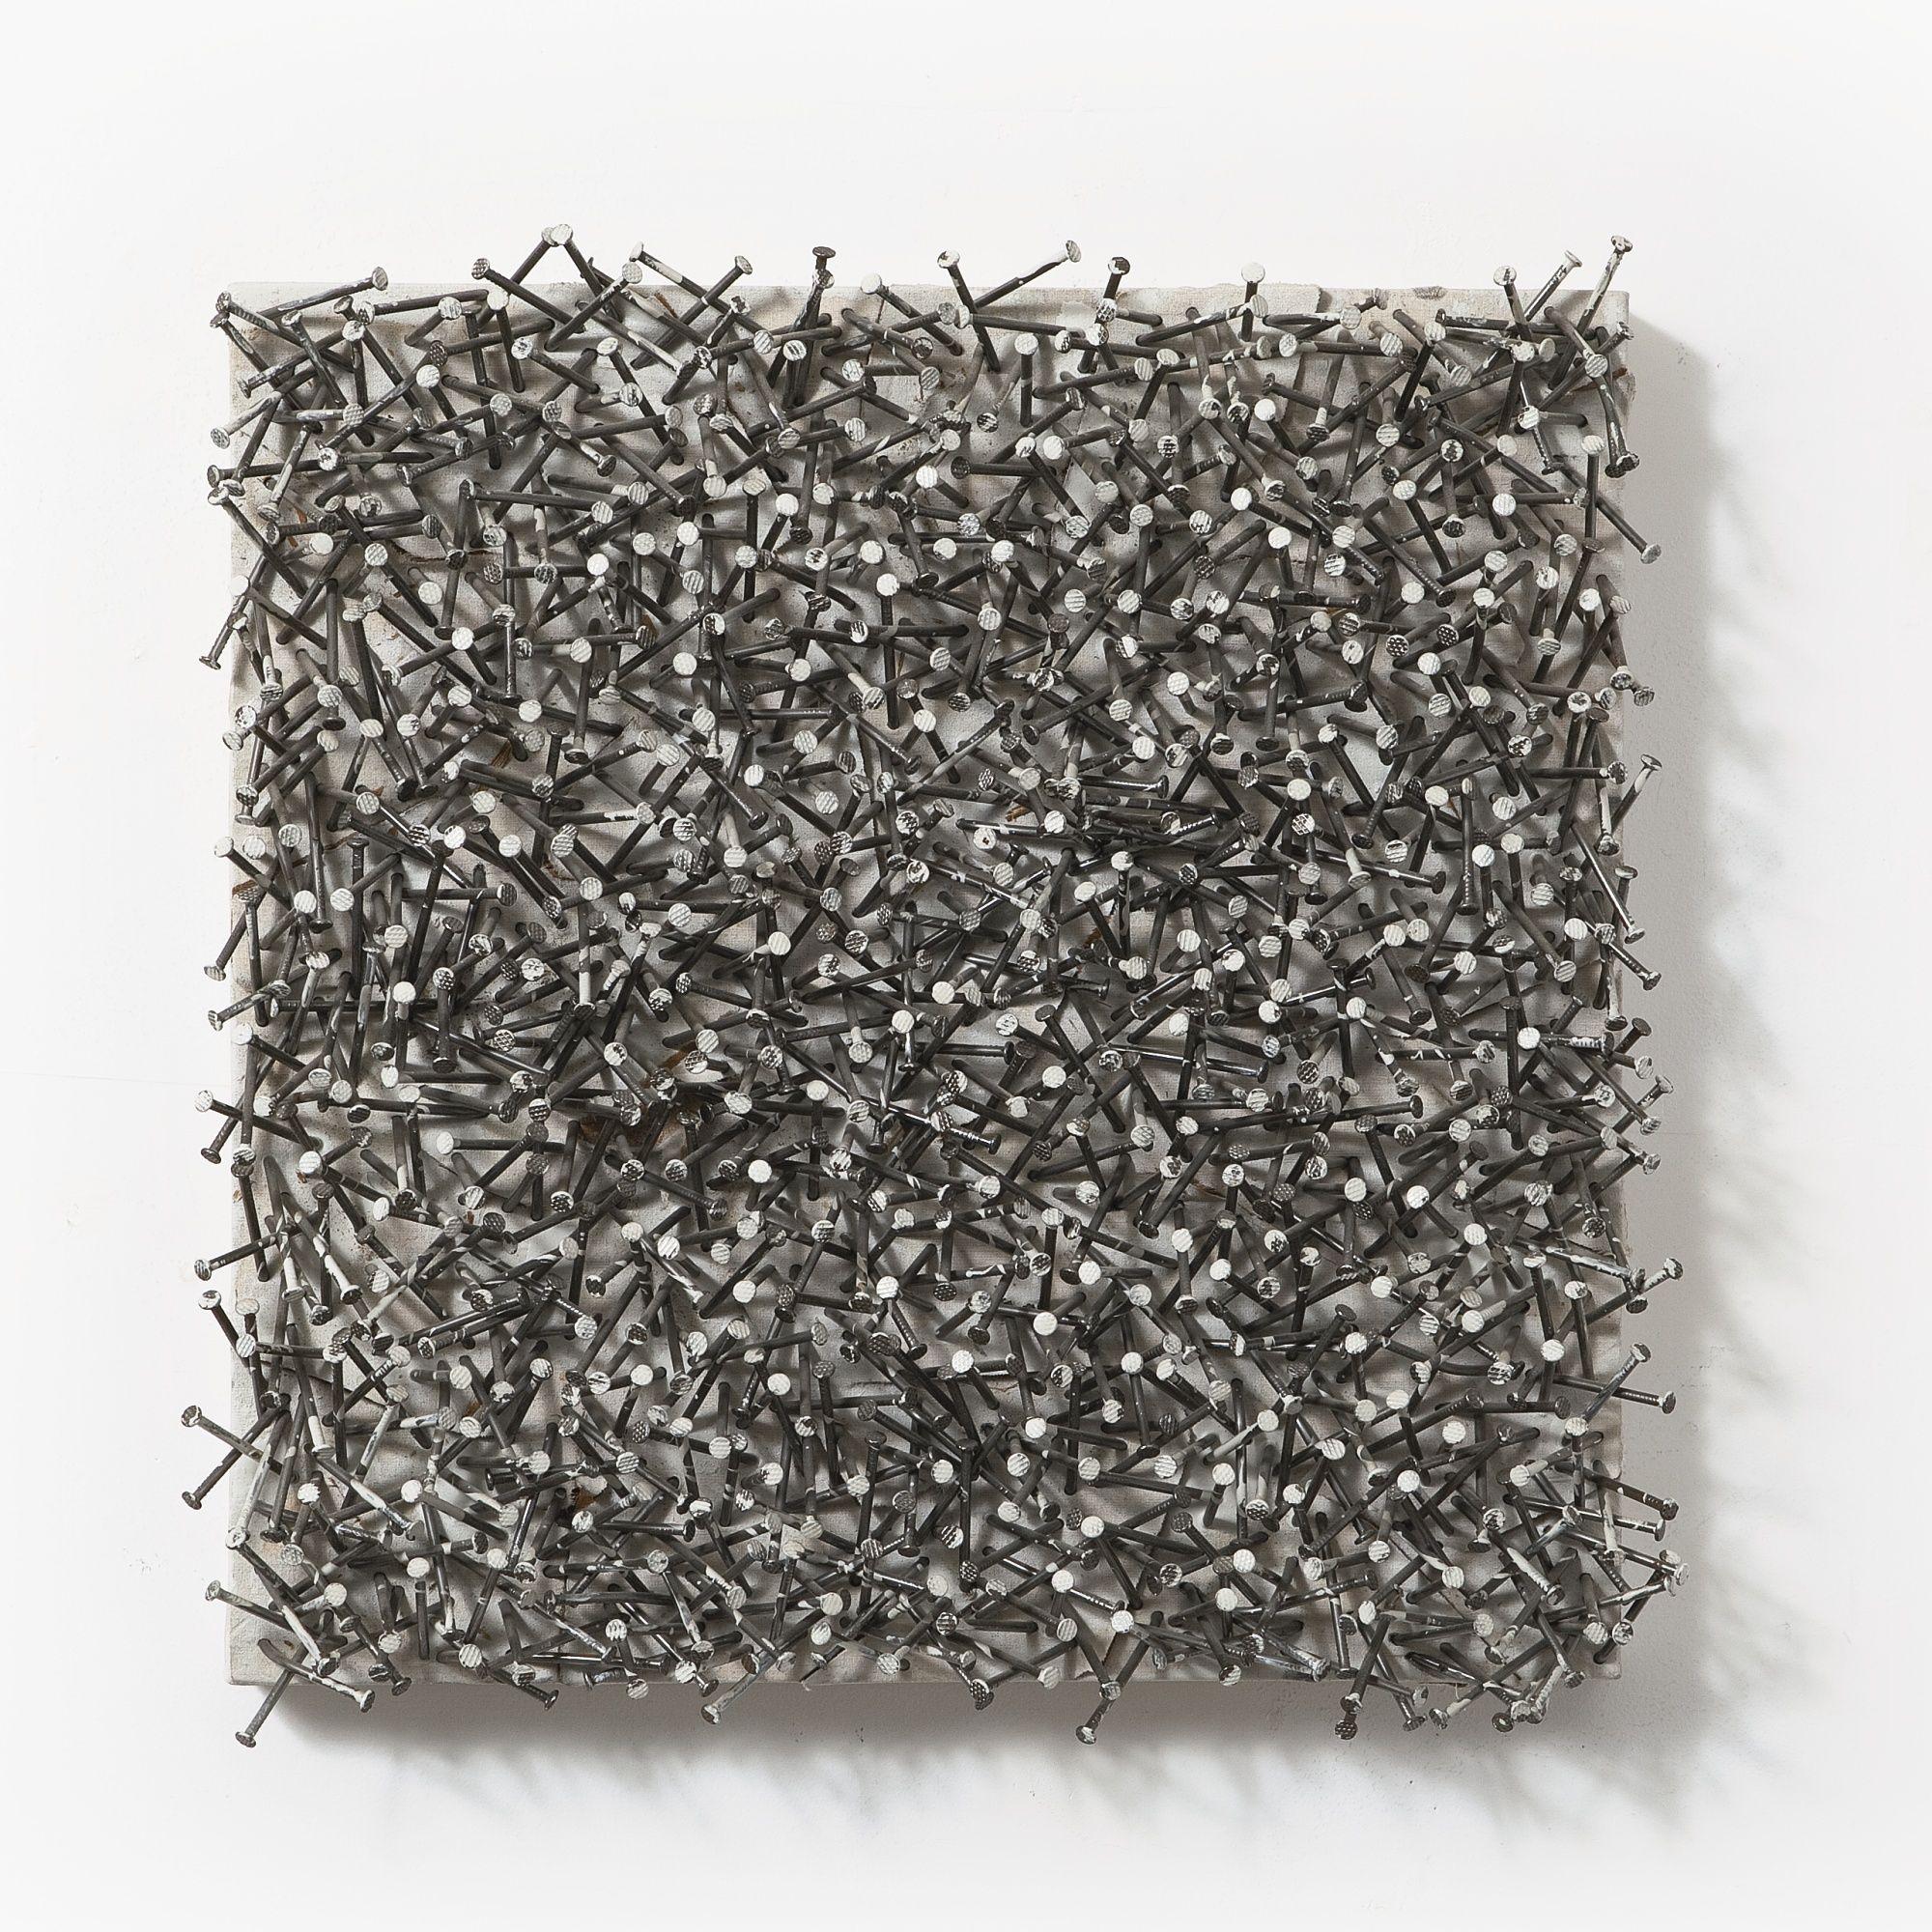 Günther Uecker | Lot | Sotheby's 12/11/14